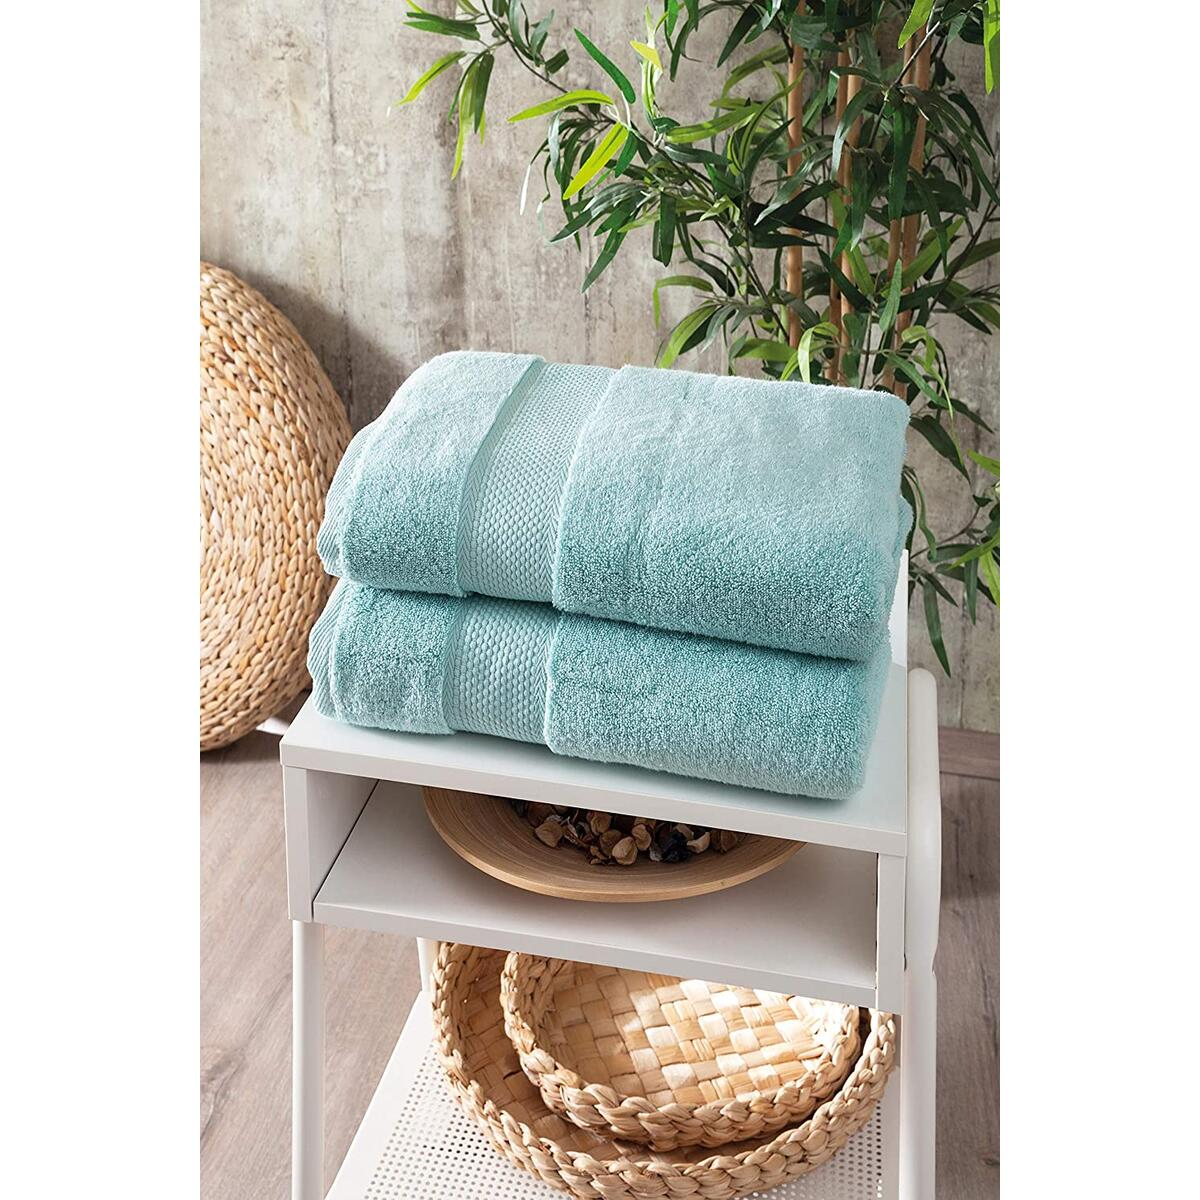 Bagno Milano Turkish Cotton Hotel Spa Towel Set, 100% Non-GMO Turkish Cotton | Ultra Soft Plush Absorbent Towels (Mint Green, 2 Pcs Bath Towel Set)